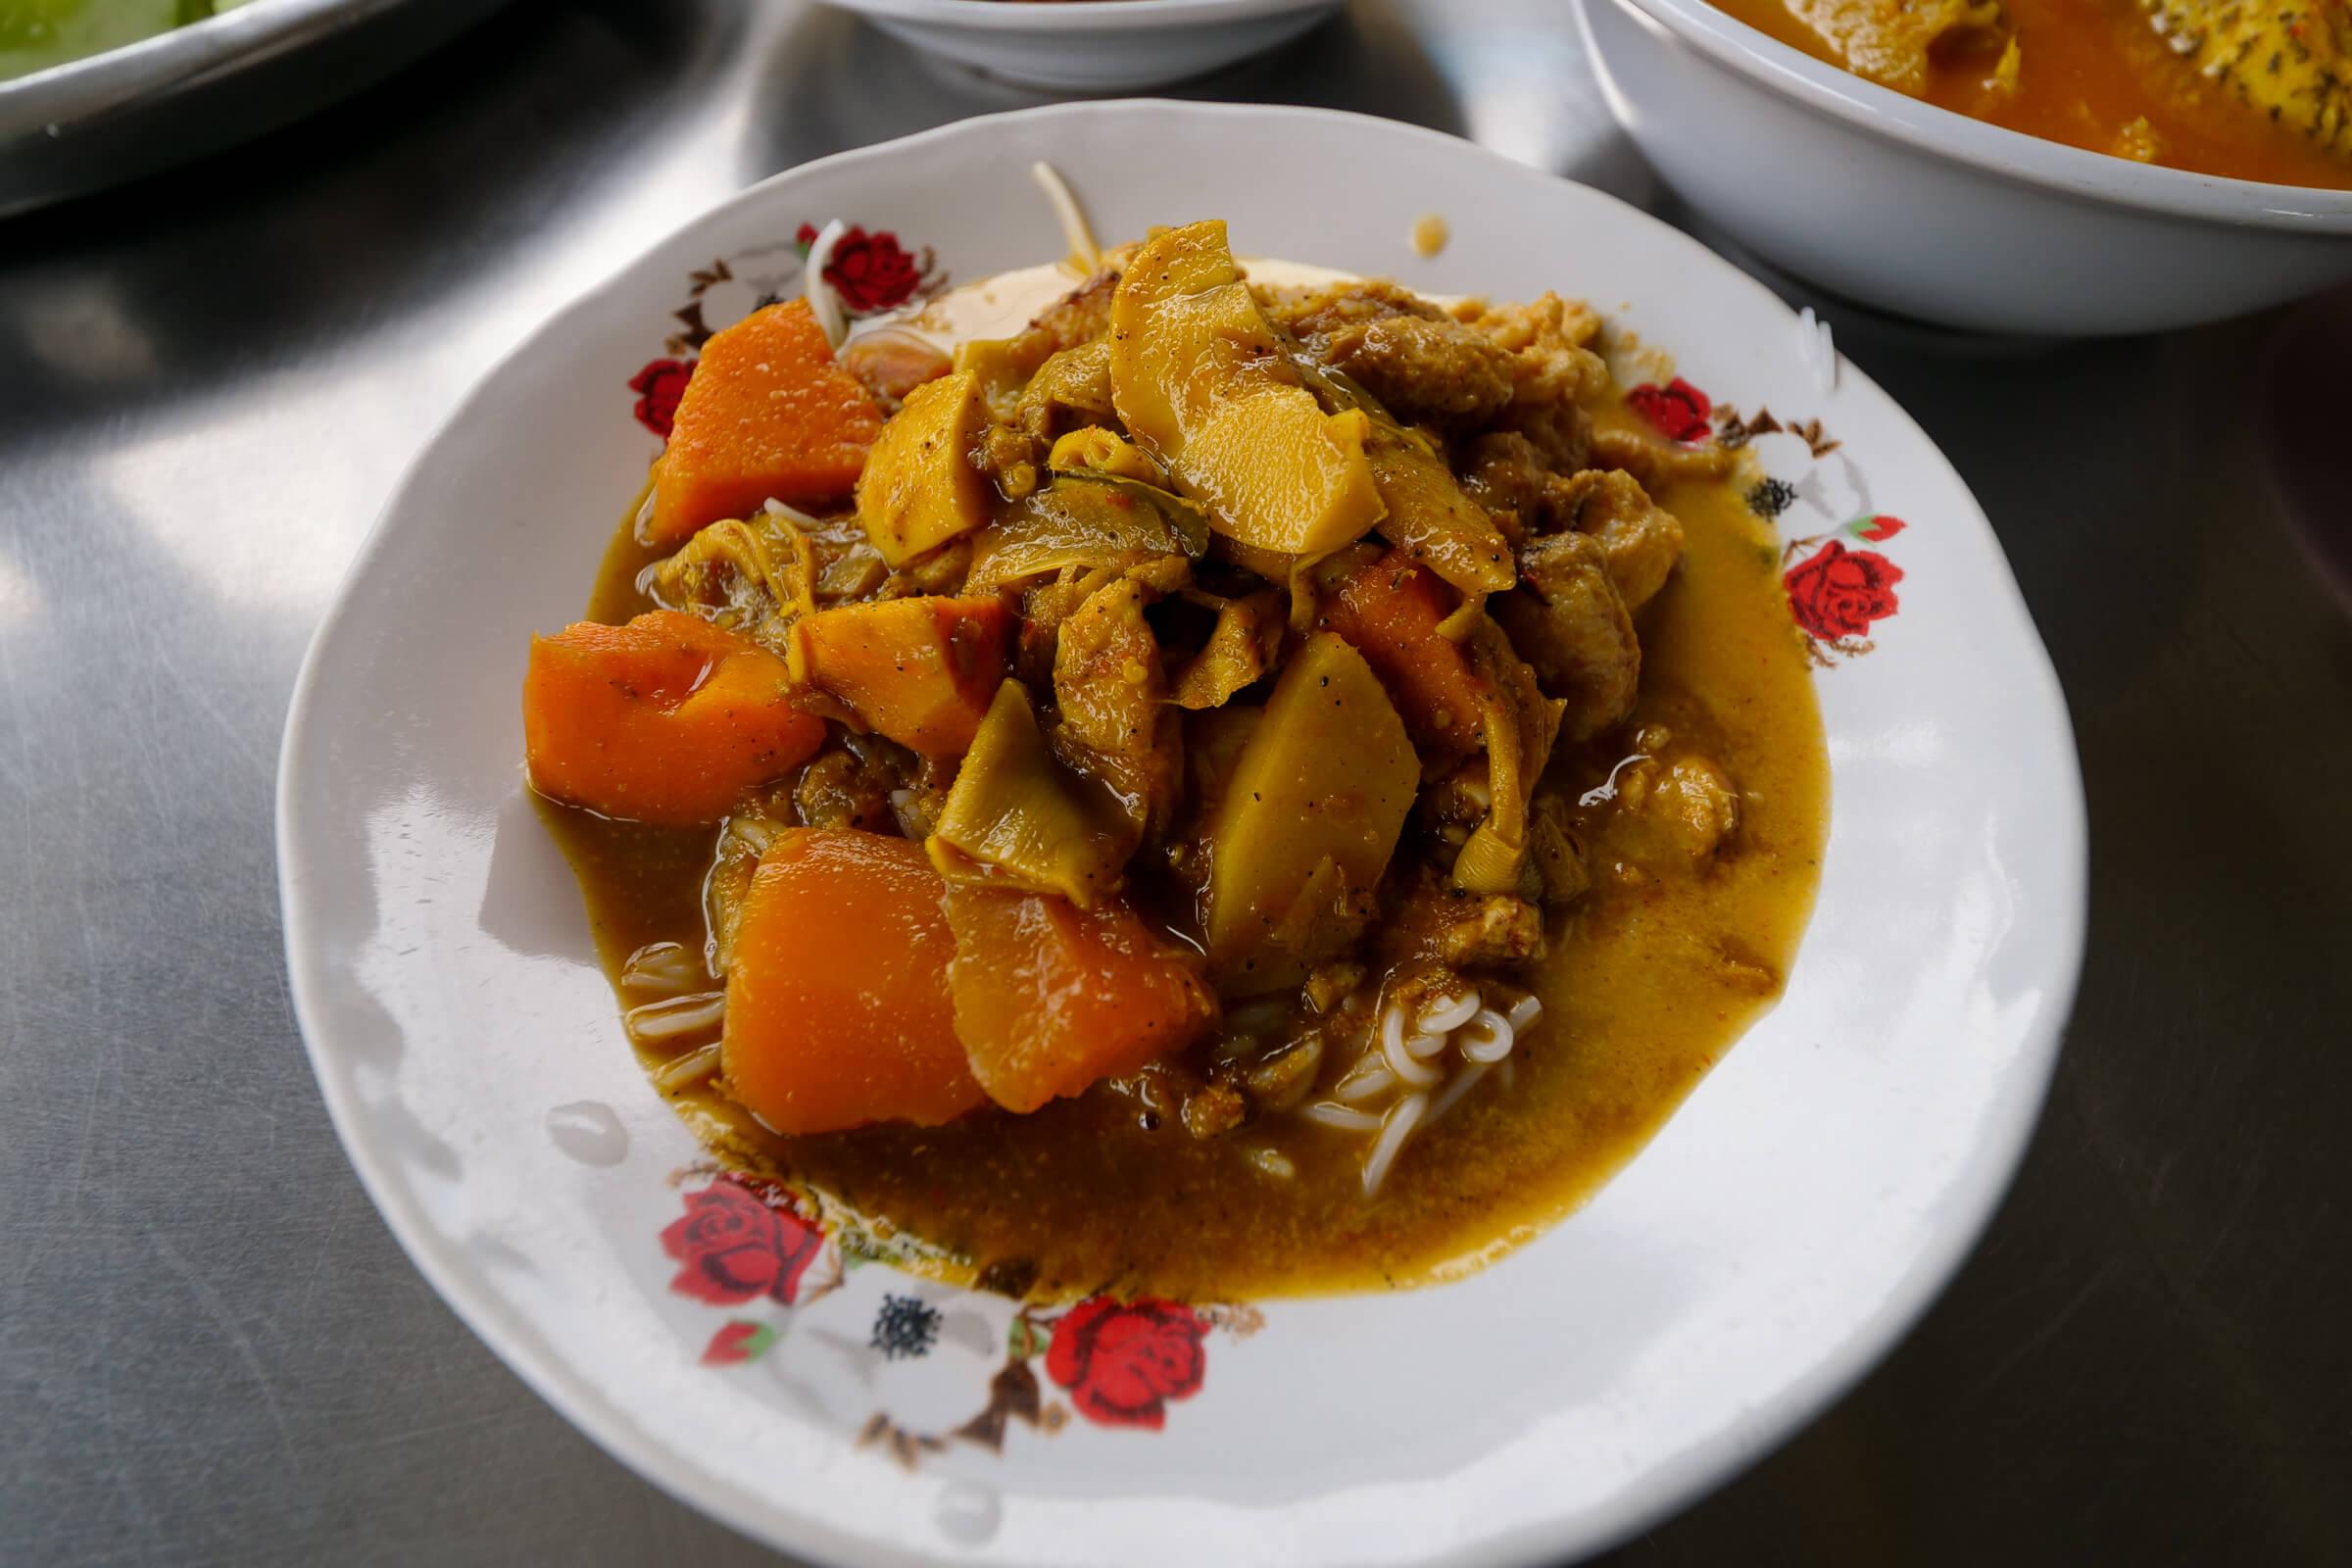 Khanom Jeen Dondakob (ร้านขนมจีนต้นตะขบ)